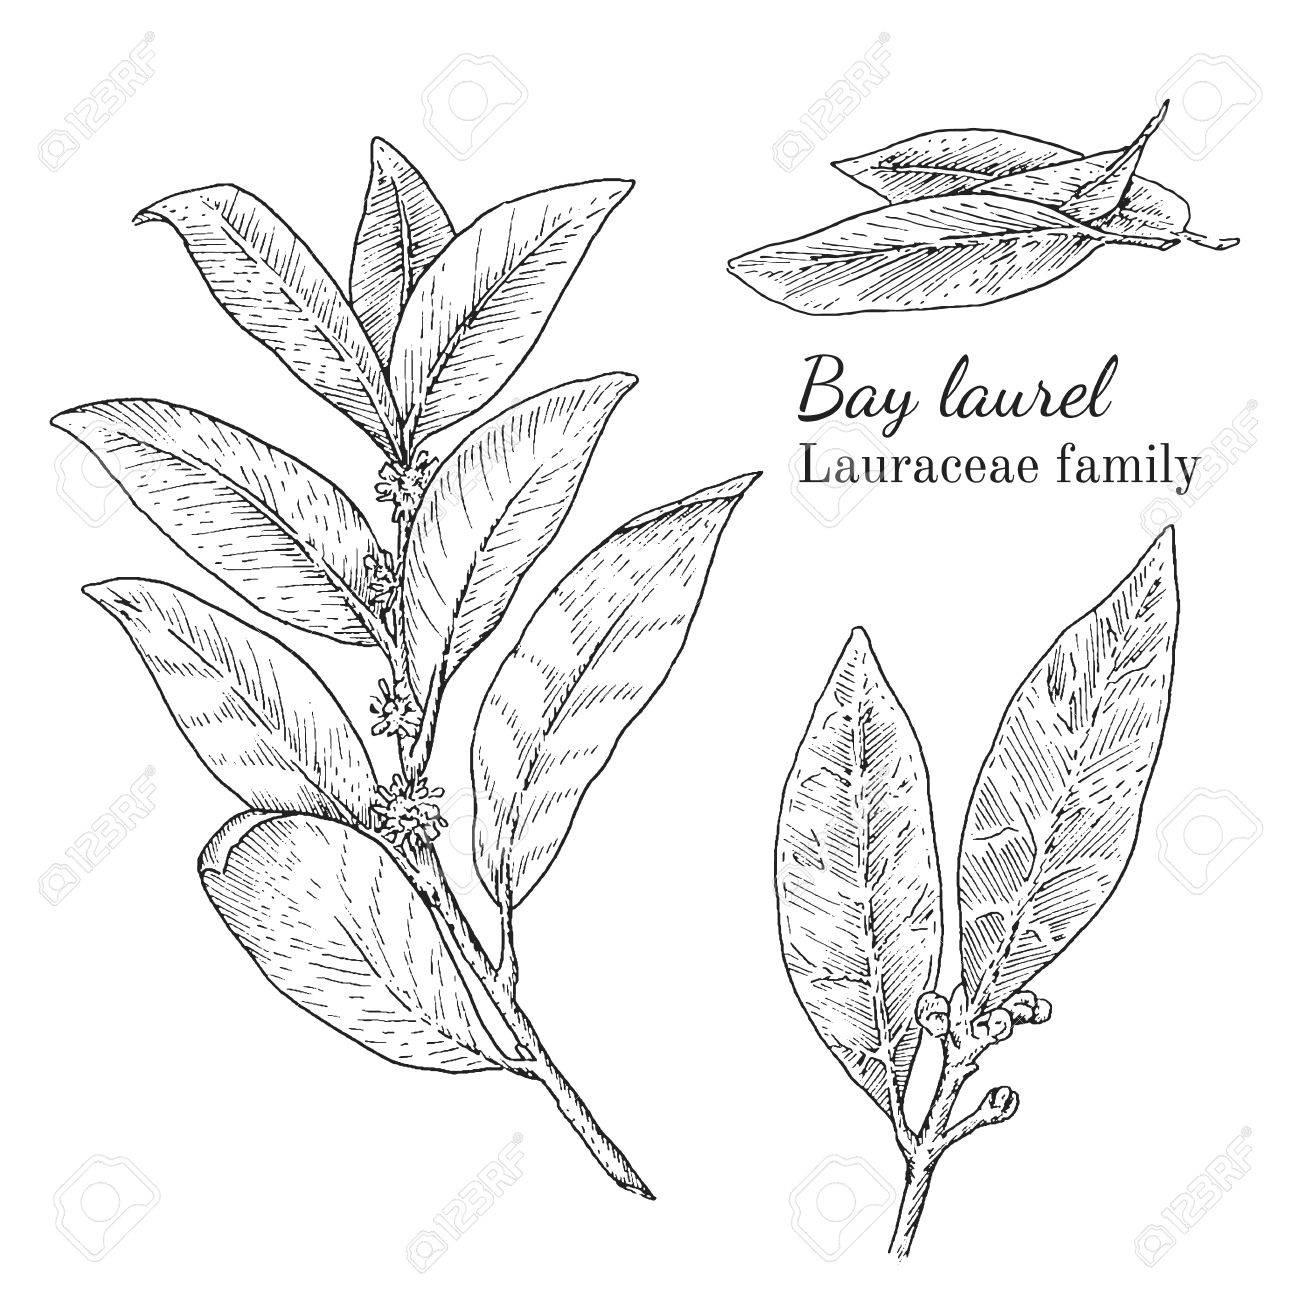 1300x1300 Ink Bay Laurel Herbal Illustration. Hand Drawn Botanical Sketch